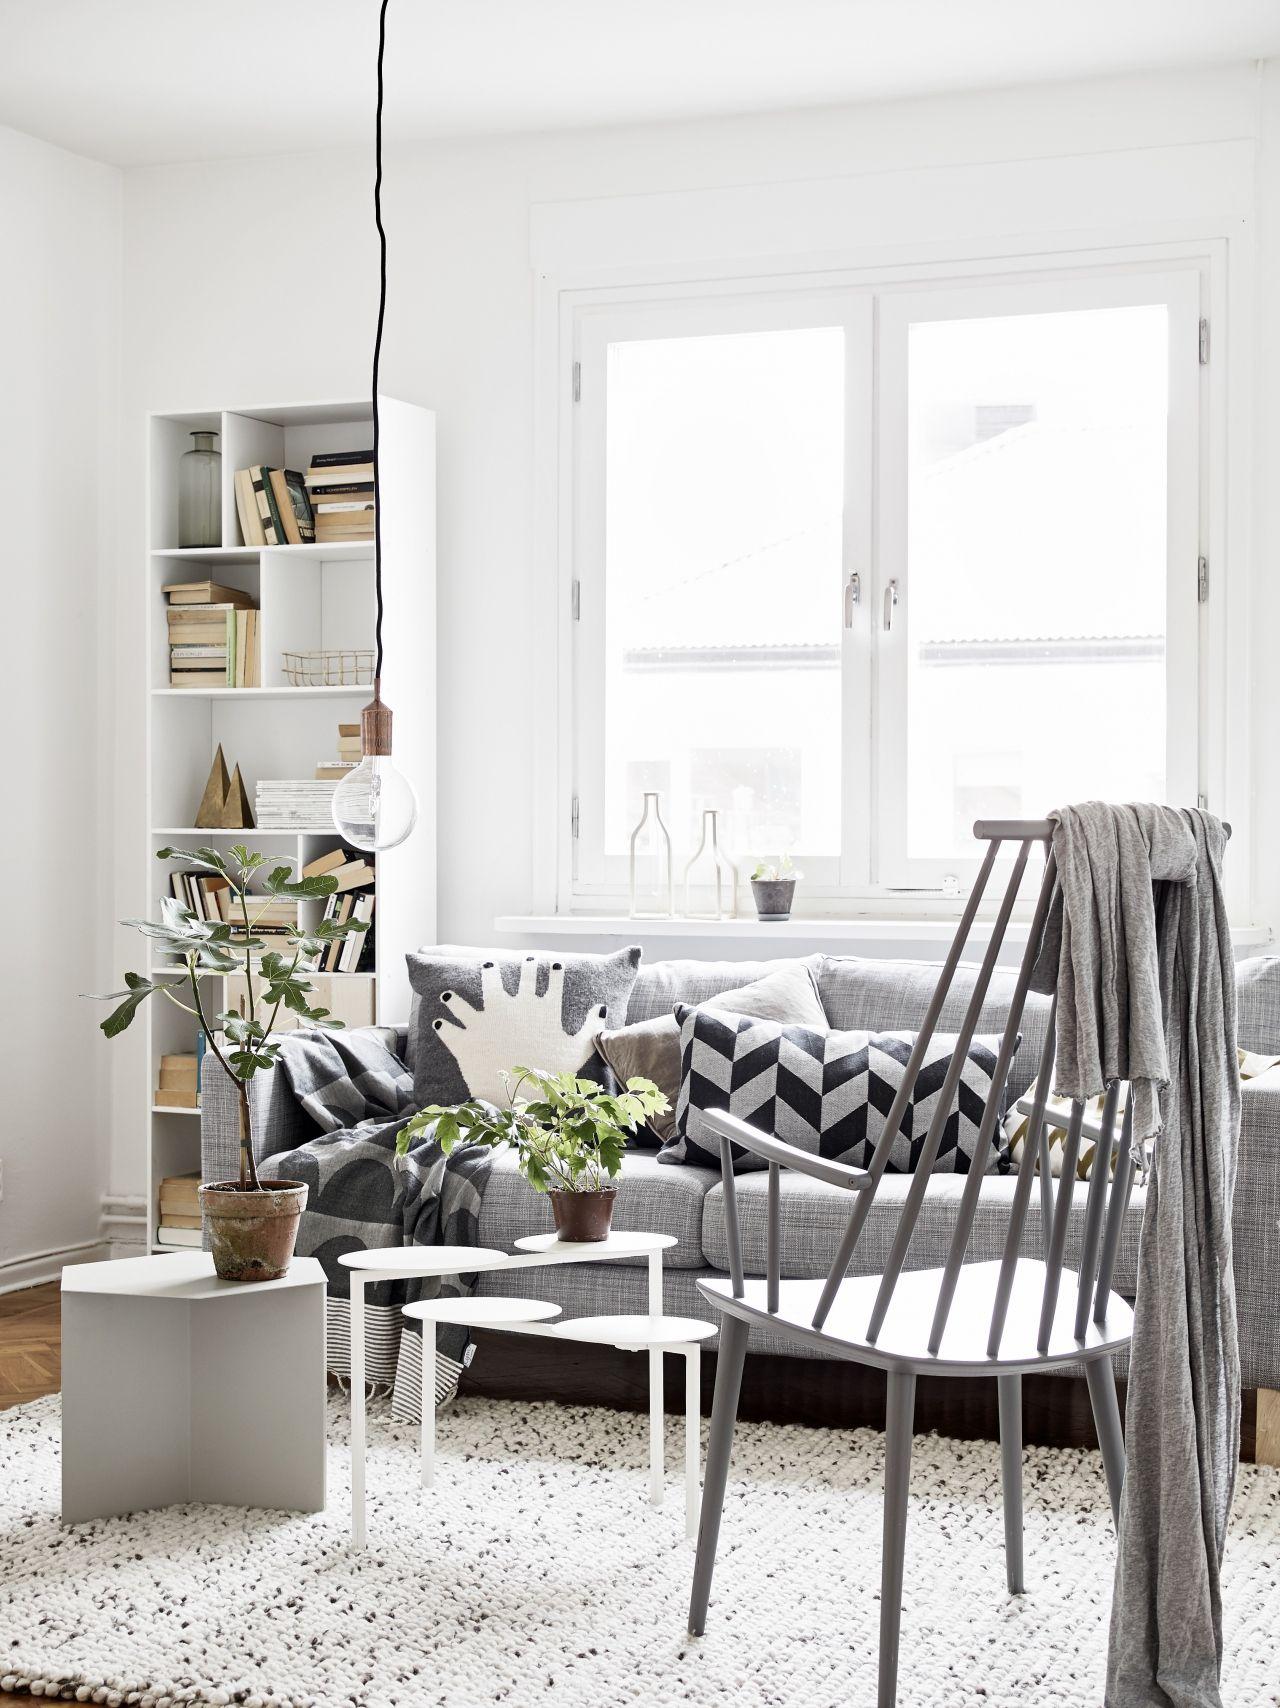 Simple is beautiful via cocolapinedesigncom